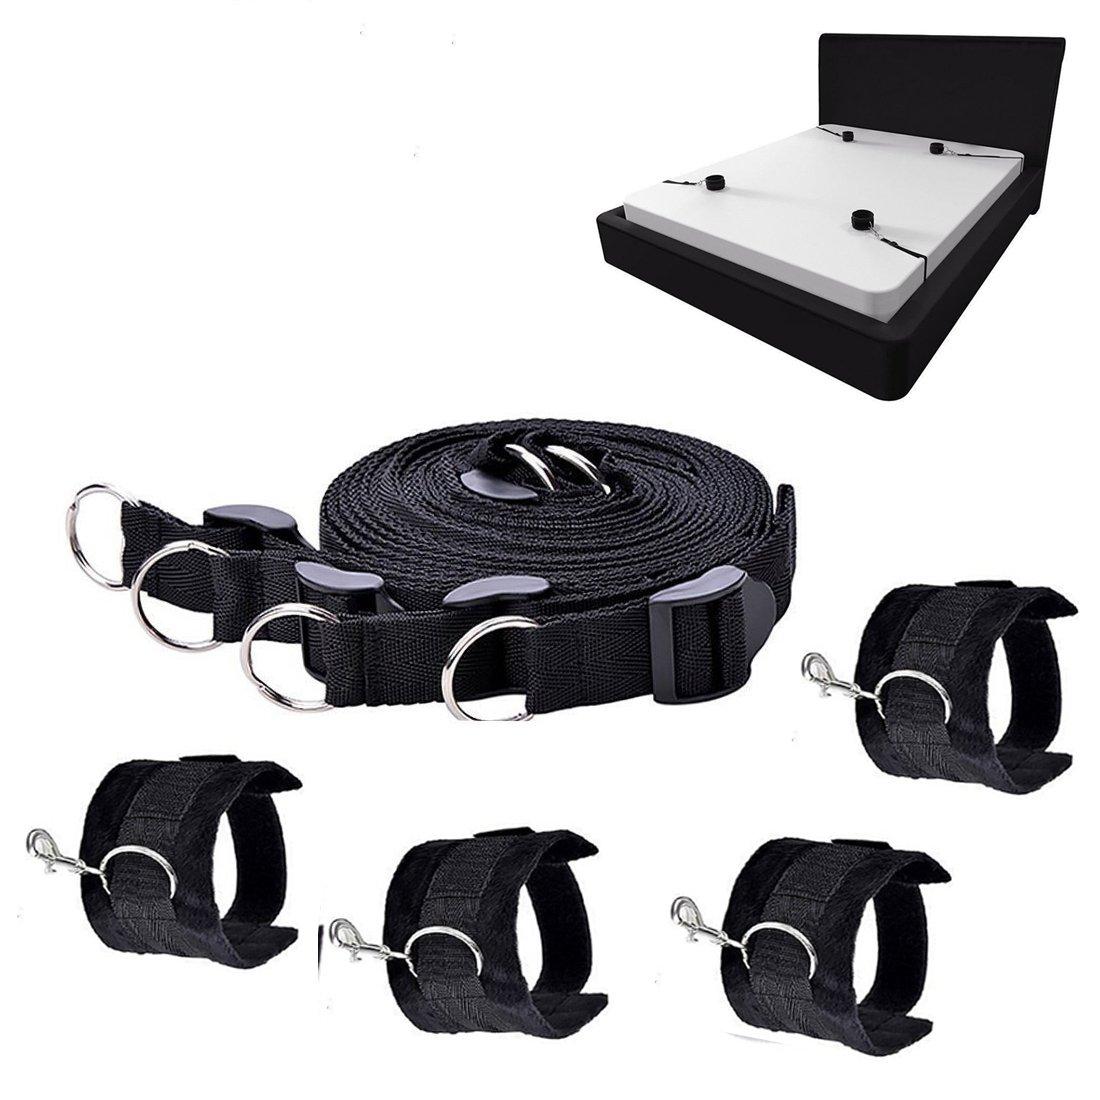 Amazon.com: Bed Restraints Bondage, Cuff Bondage Kit Set Handcuffs Strap Sex  Toys with Adjustable Soft Hand & Leg Cuffs Fetish Kit Hand Ankle Couple Sex  ...